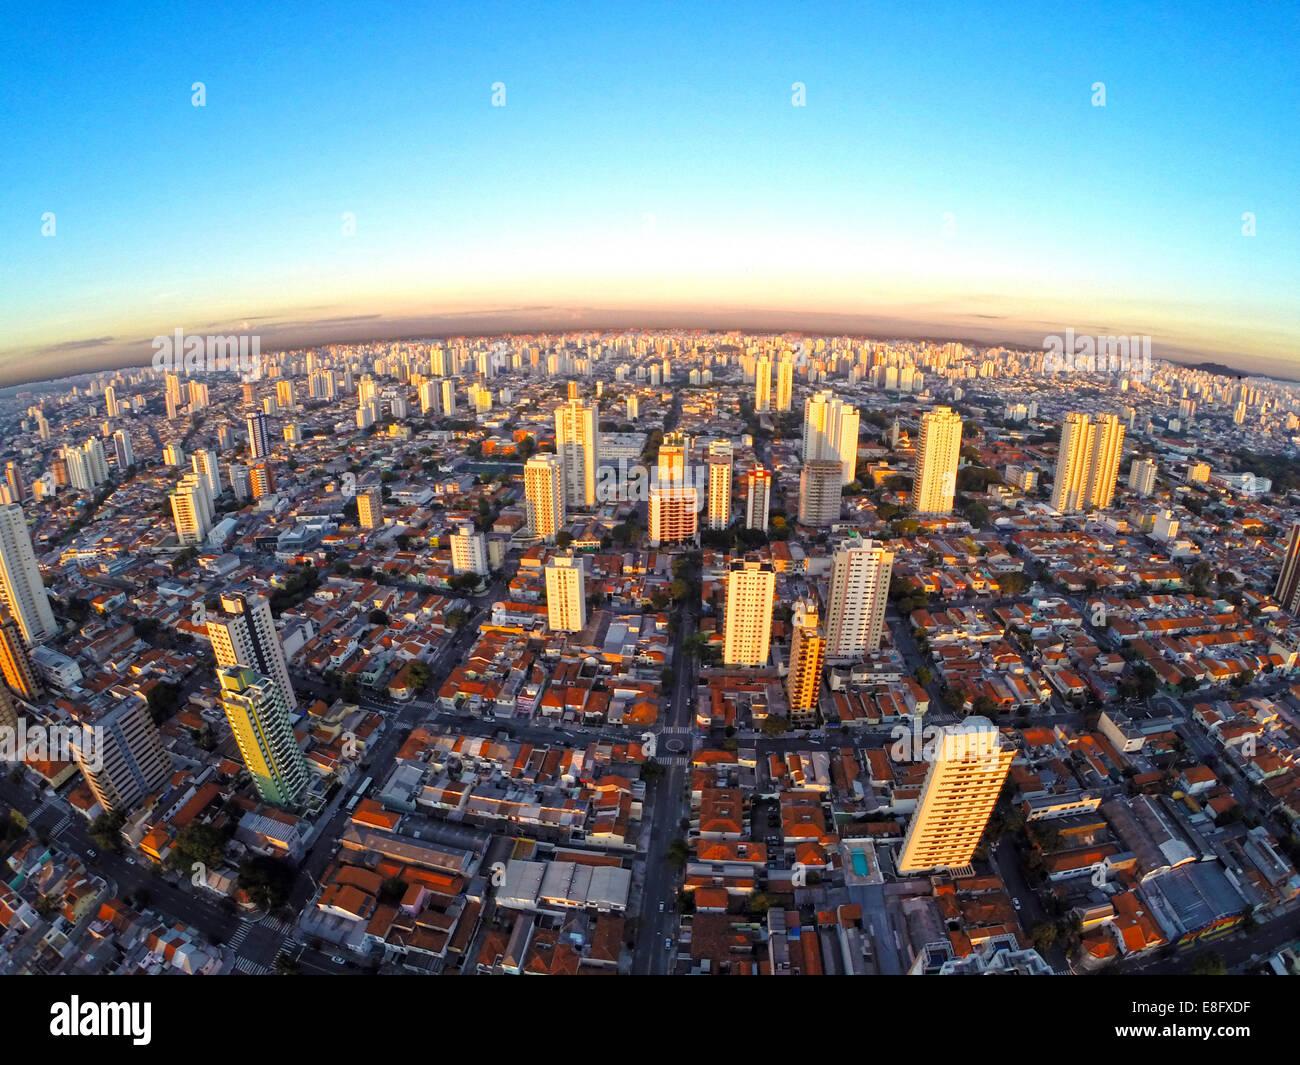 Brazil, Cityscape of south side of Sao Paulo city - Stock Image